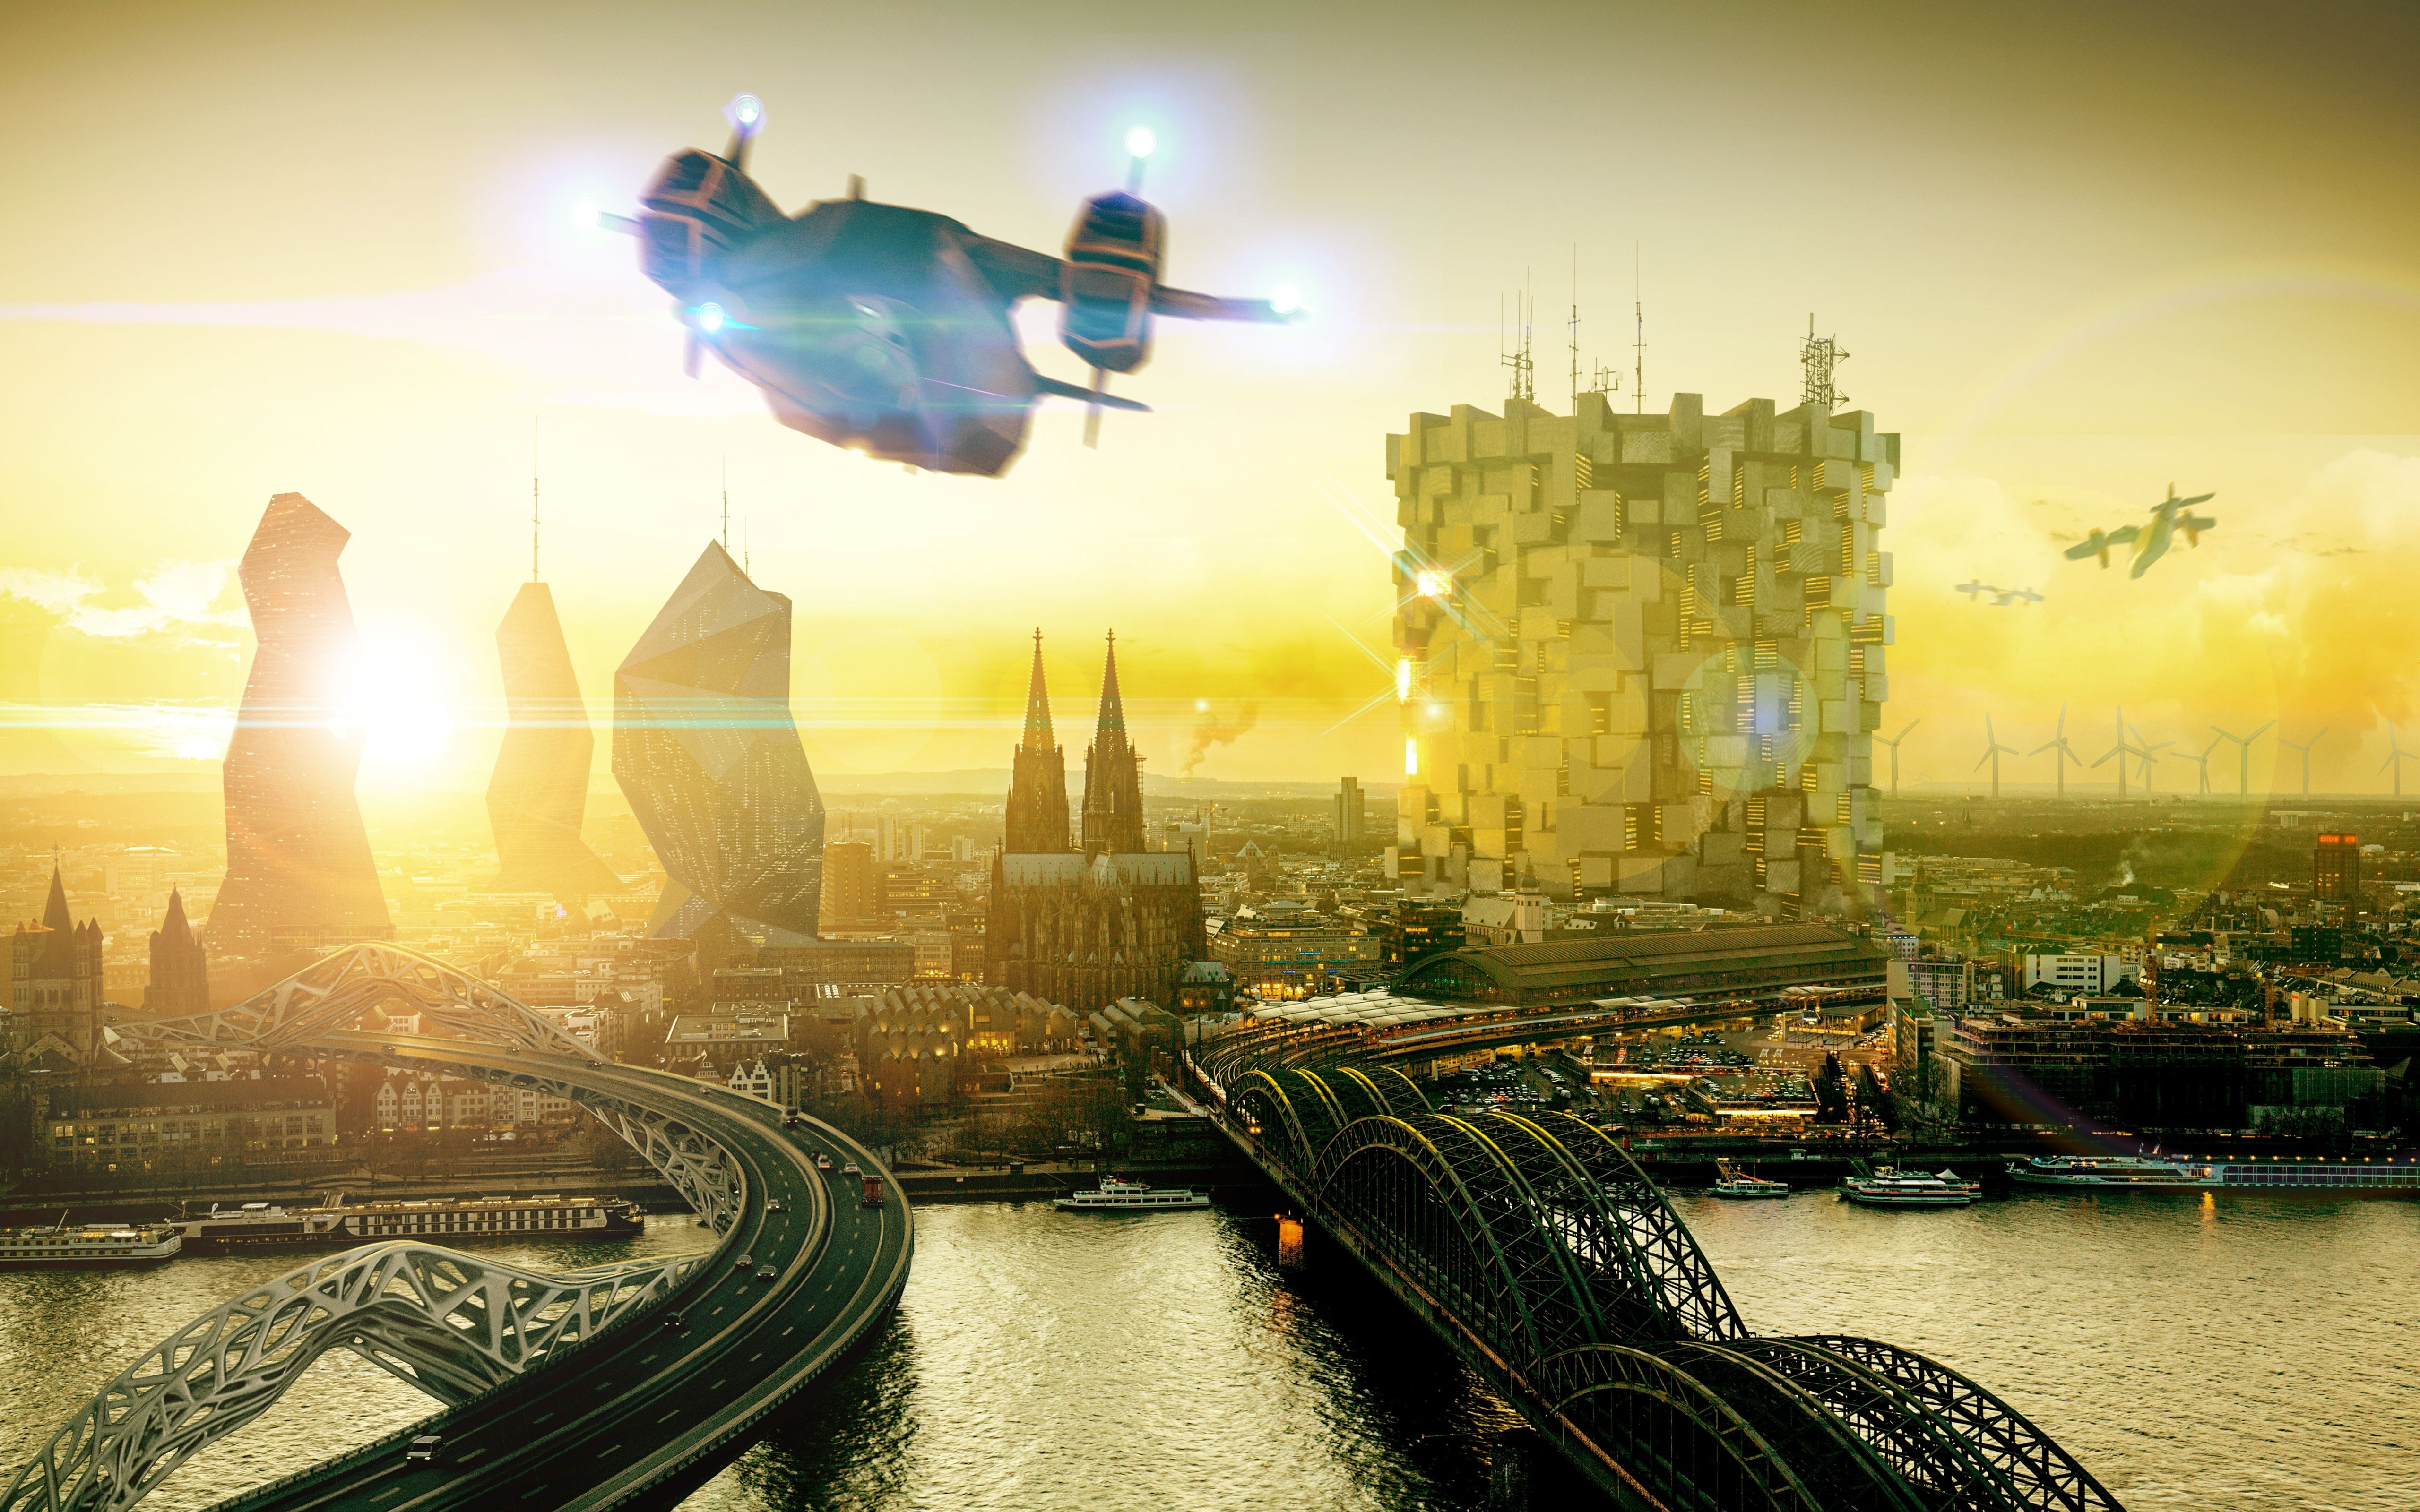 Deus Ex Wants World 2029 Wallpaper